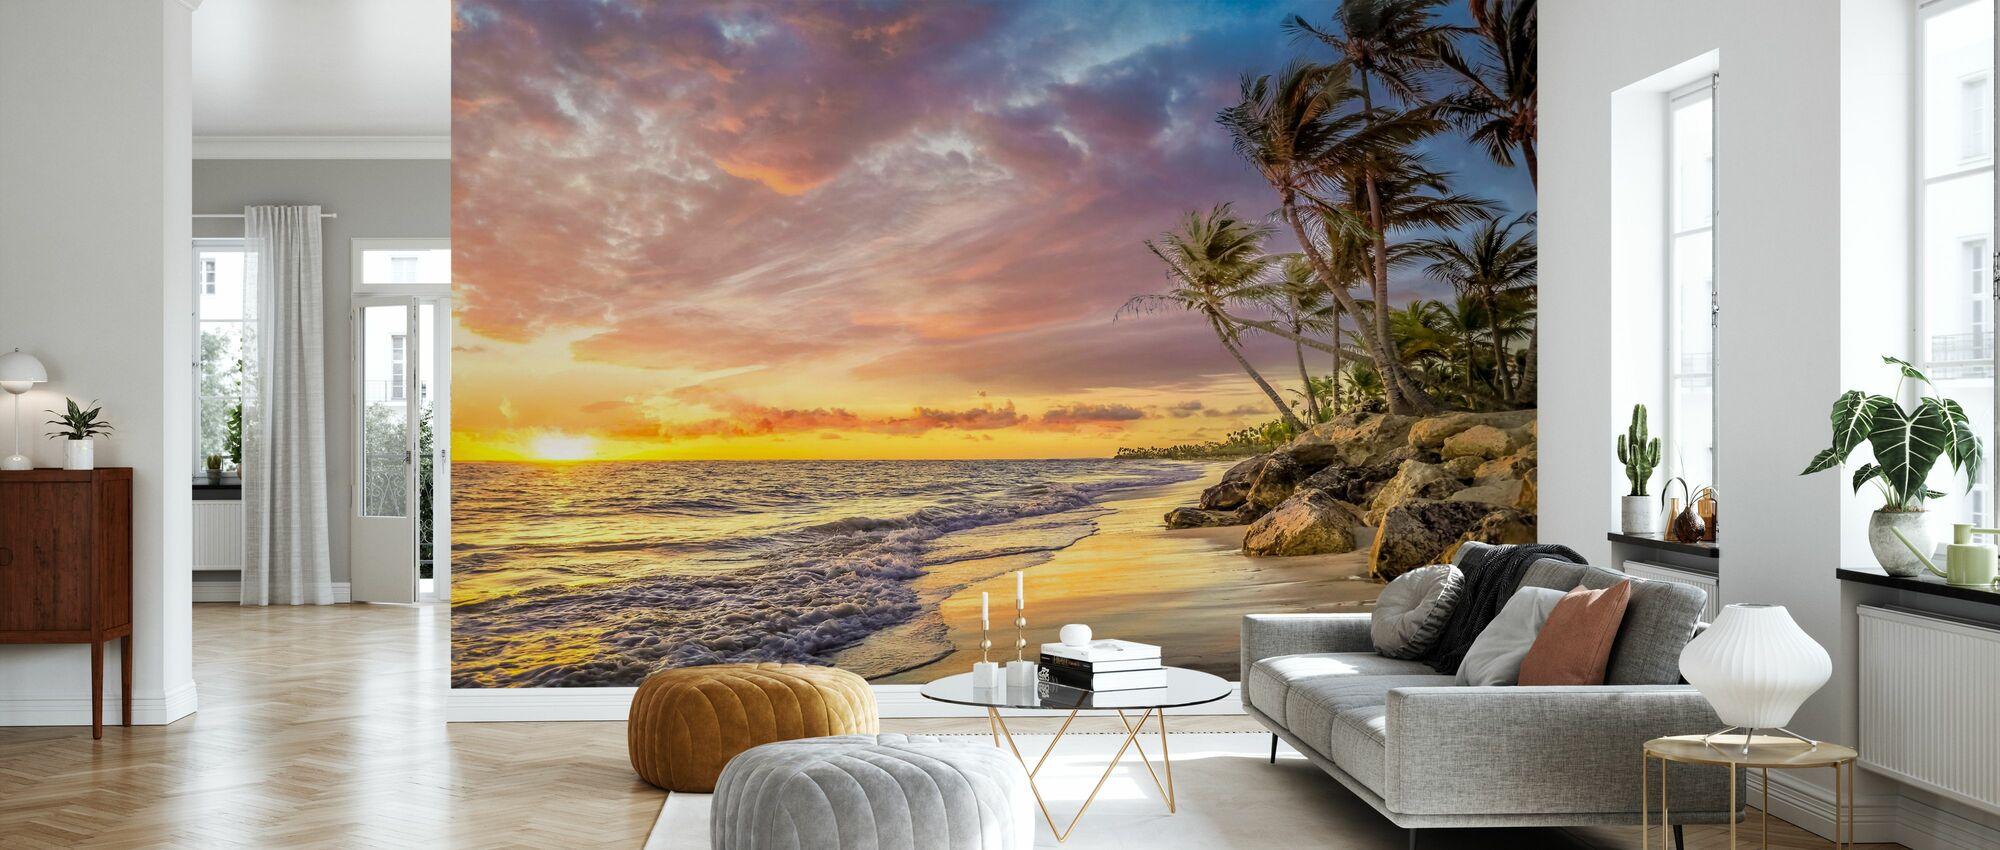 Palm Tree in Sunset - Wallpaper - Living Room